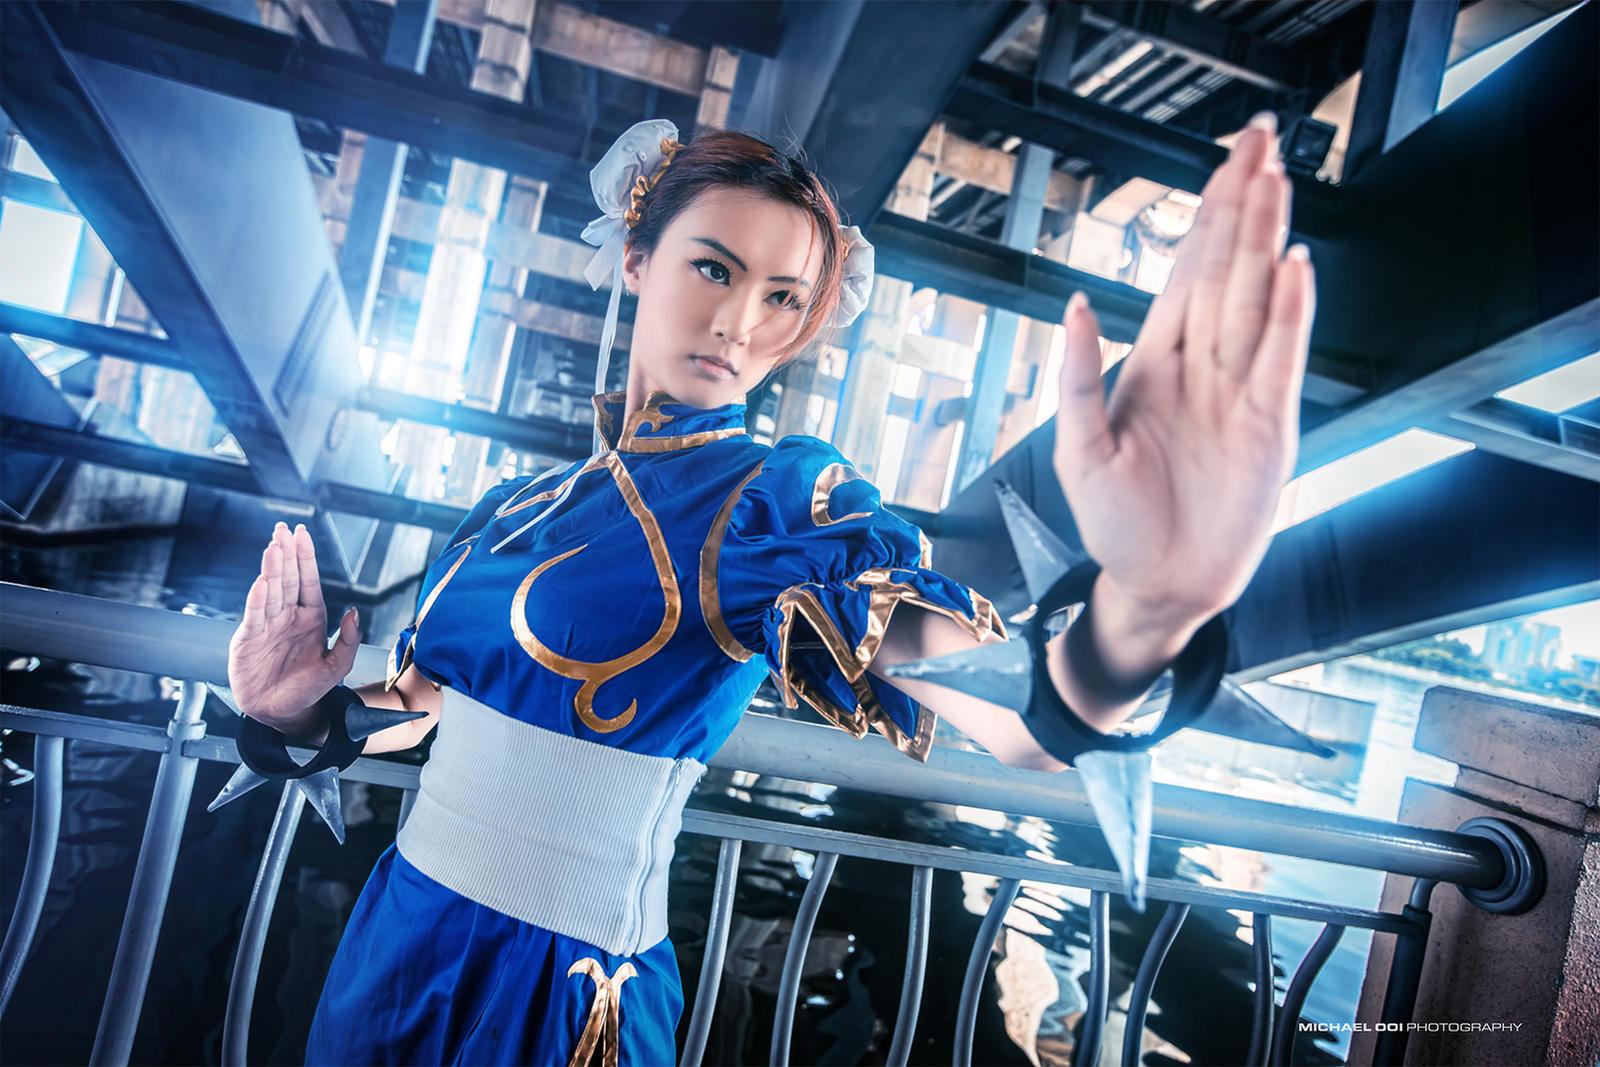 Street Fighter - Chun Li by wkwebsite